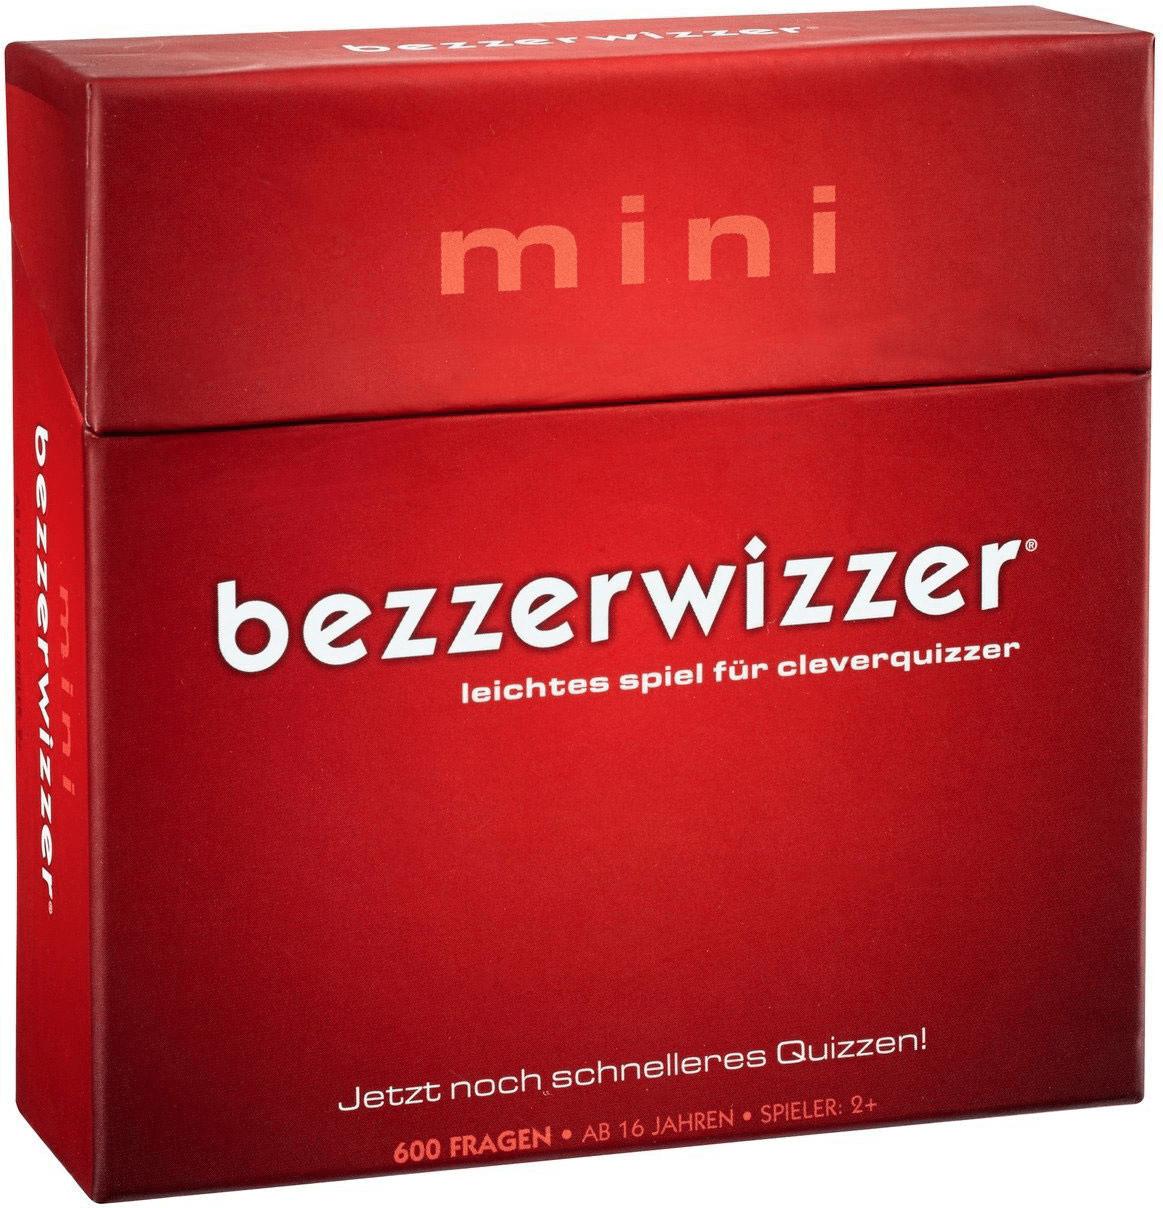 Mattel Bezzerwizzer mini